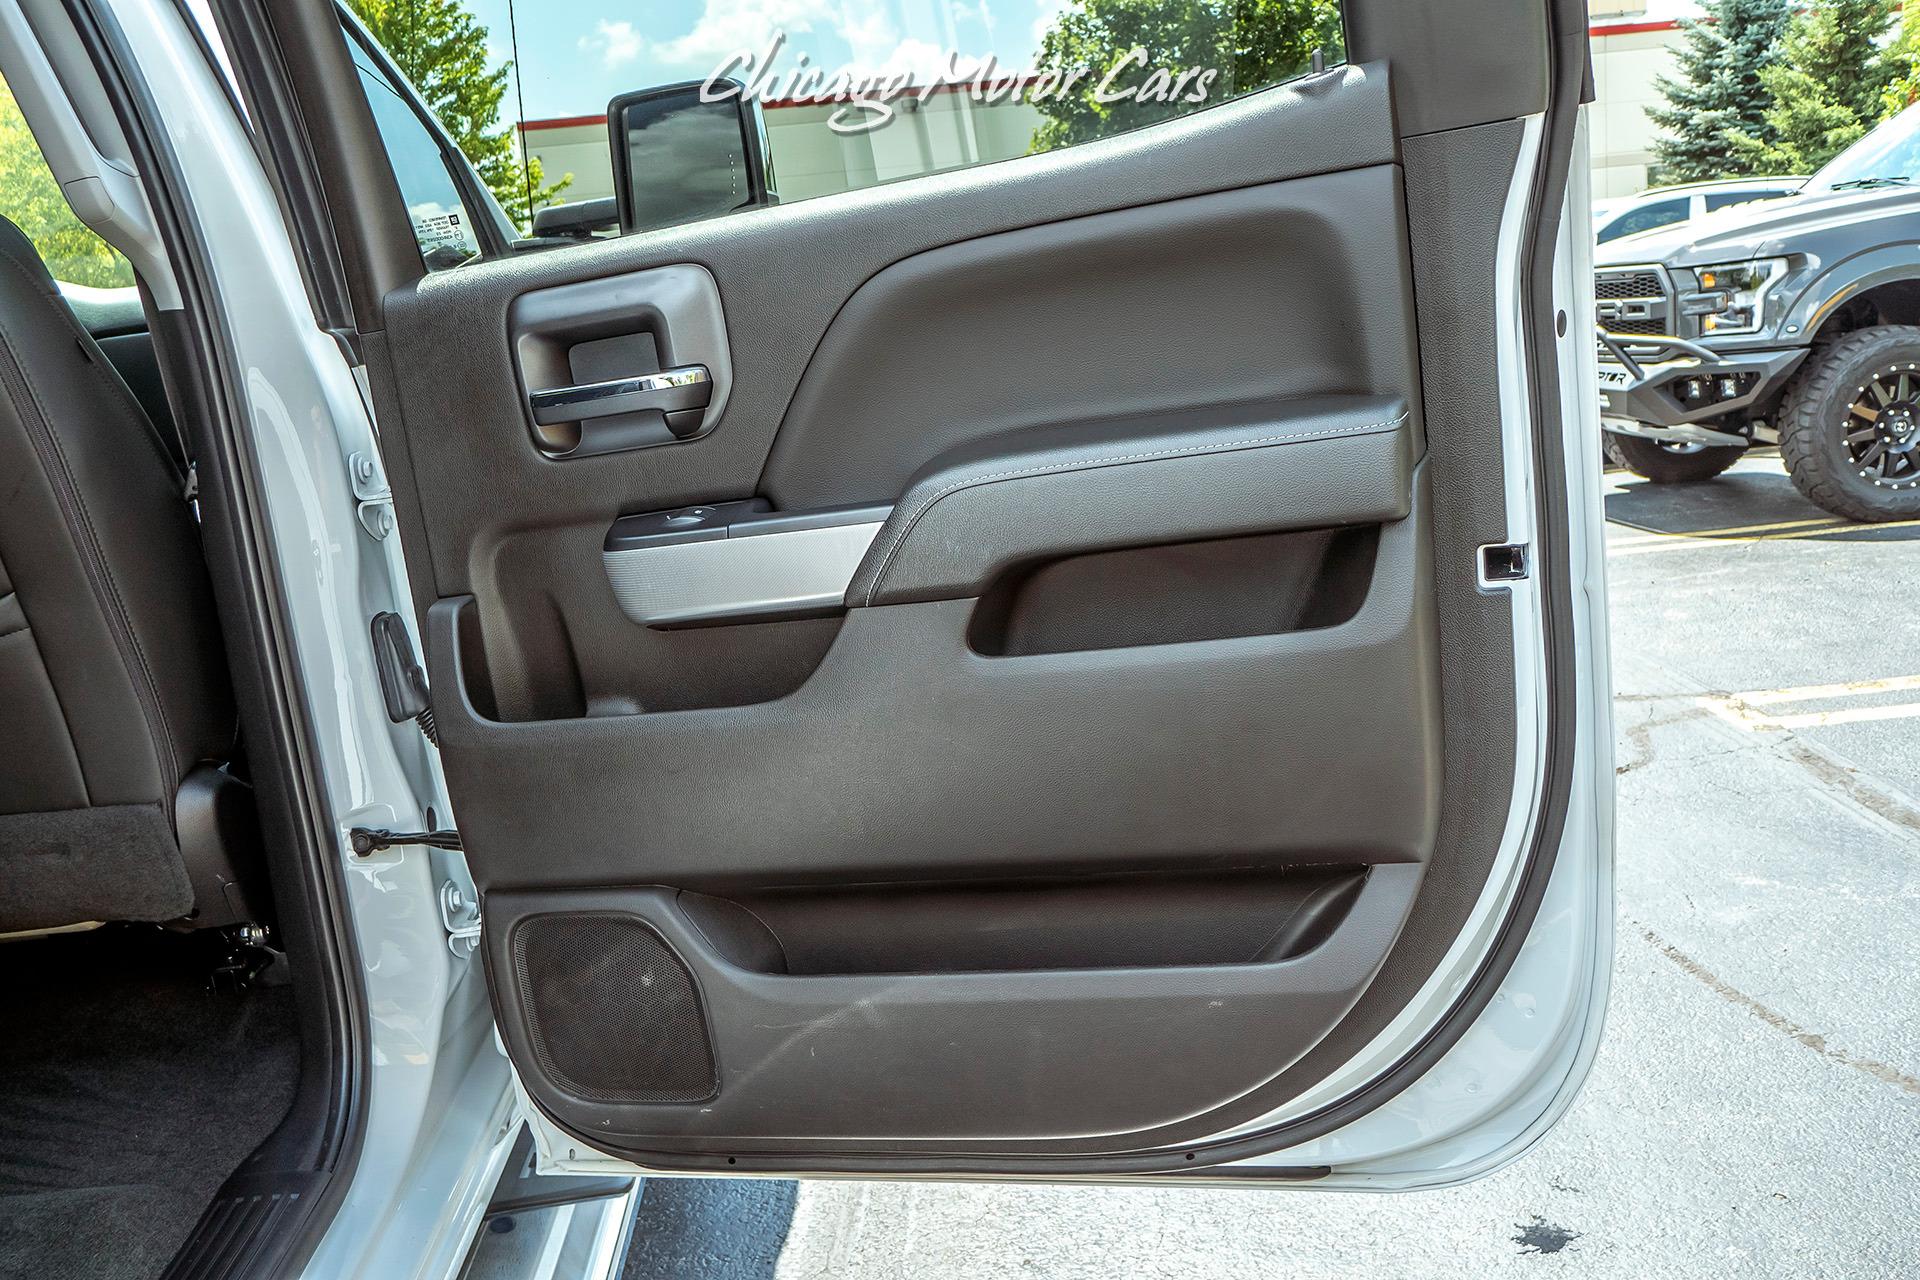 Used 2018 Chevrolet Silverado 2500HD LTZ Duramax Diesel 4x4